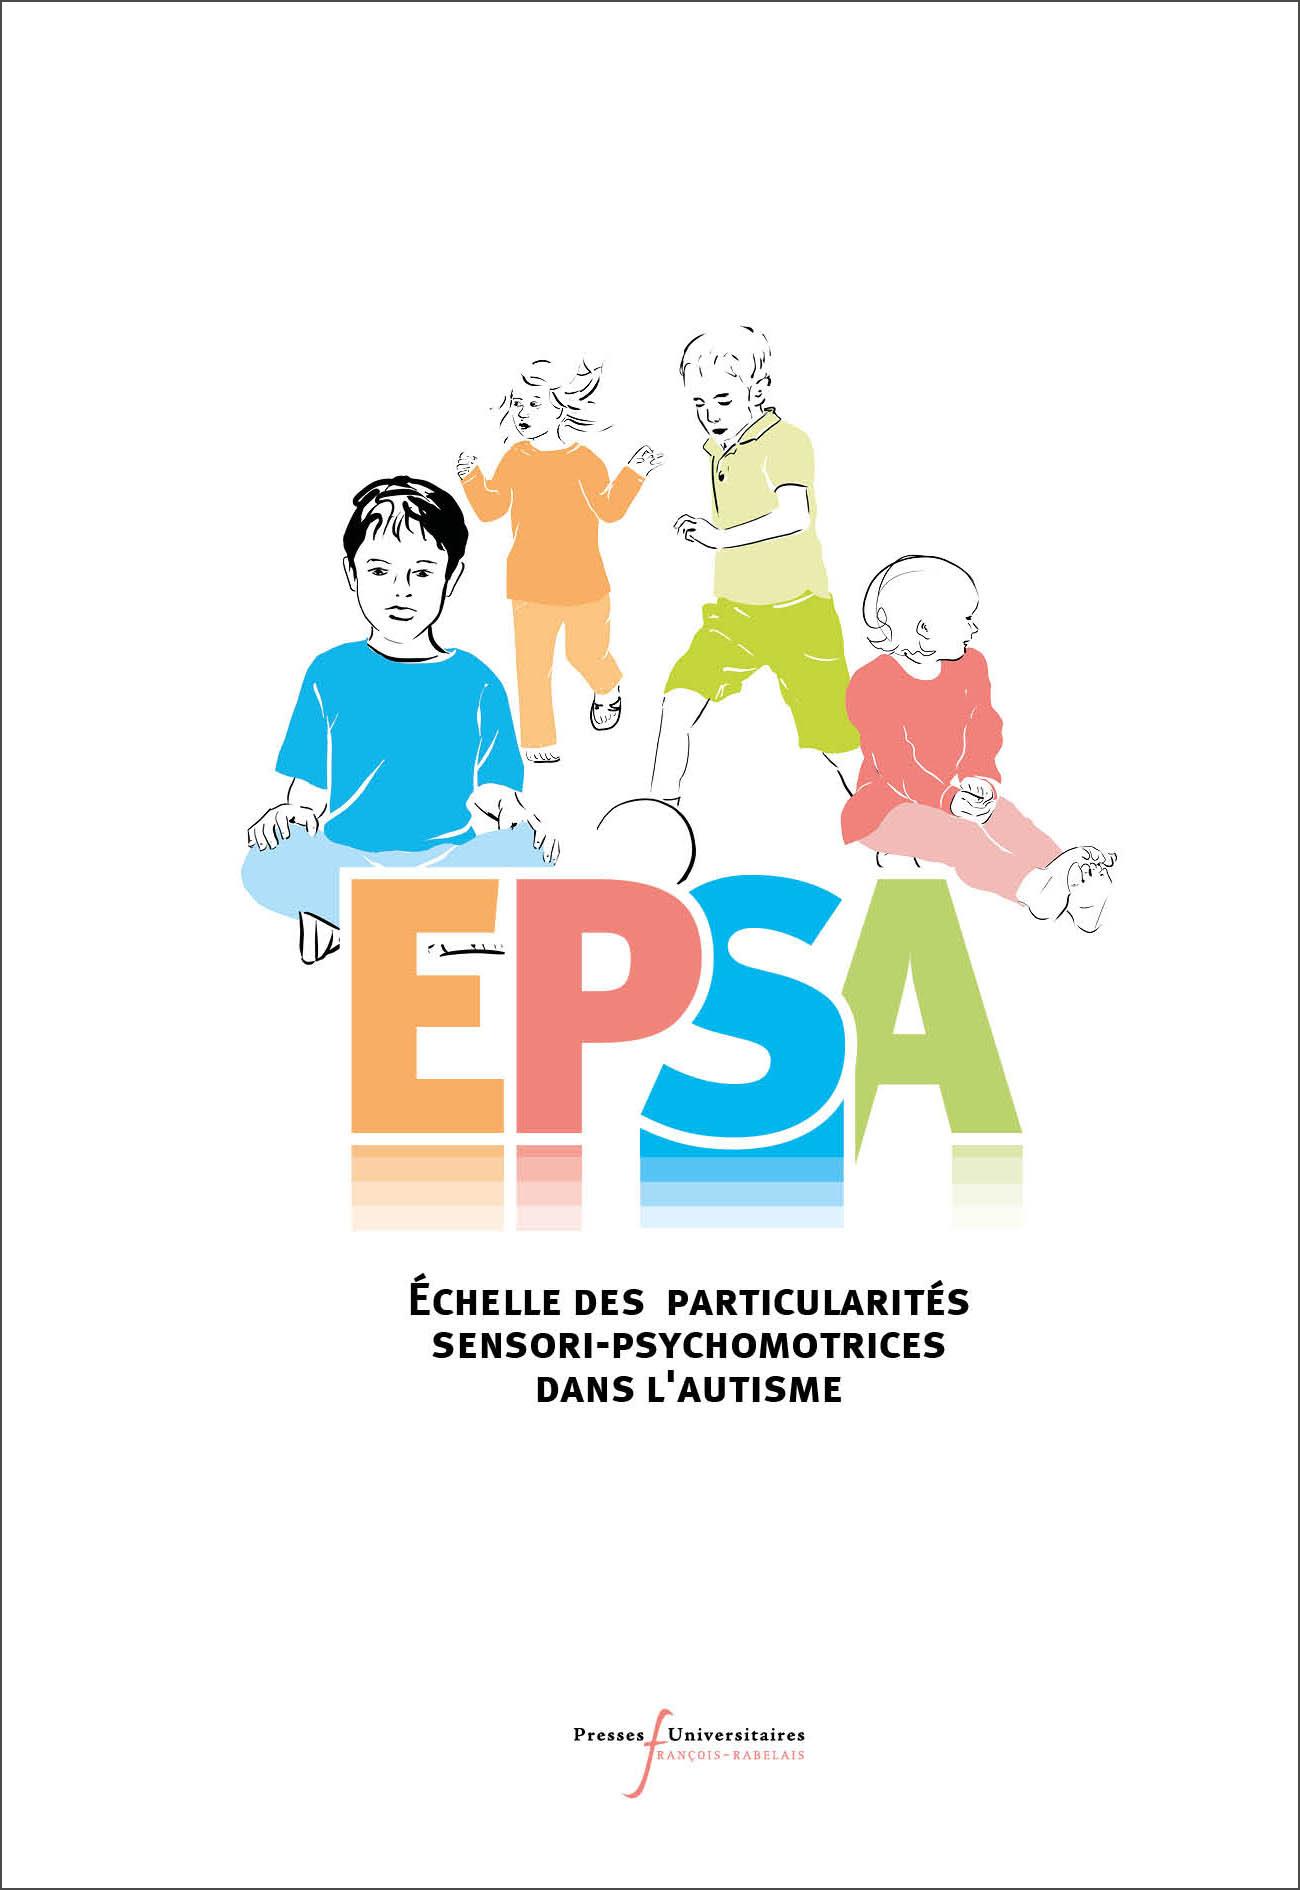 EPSA – coffret